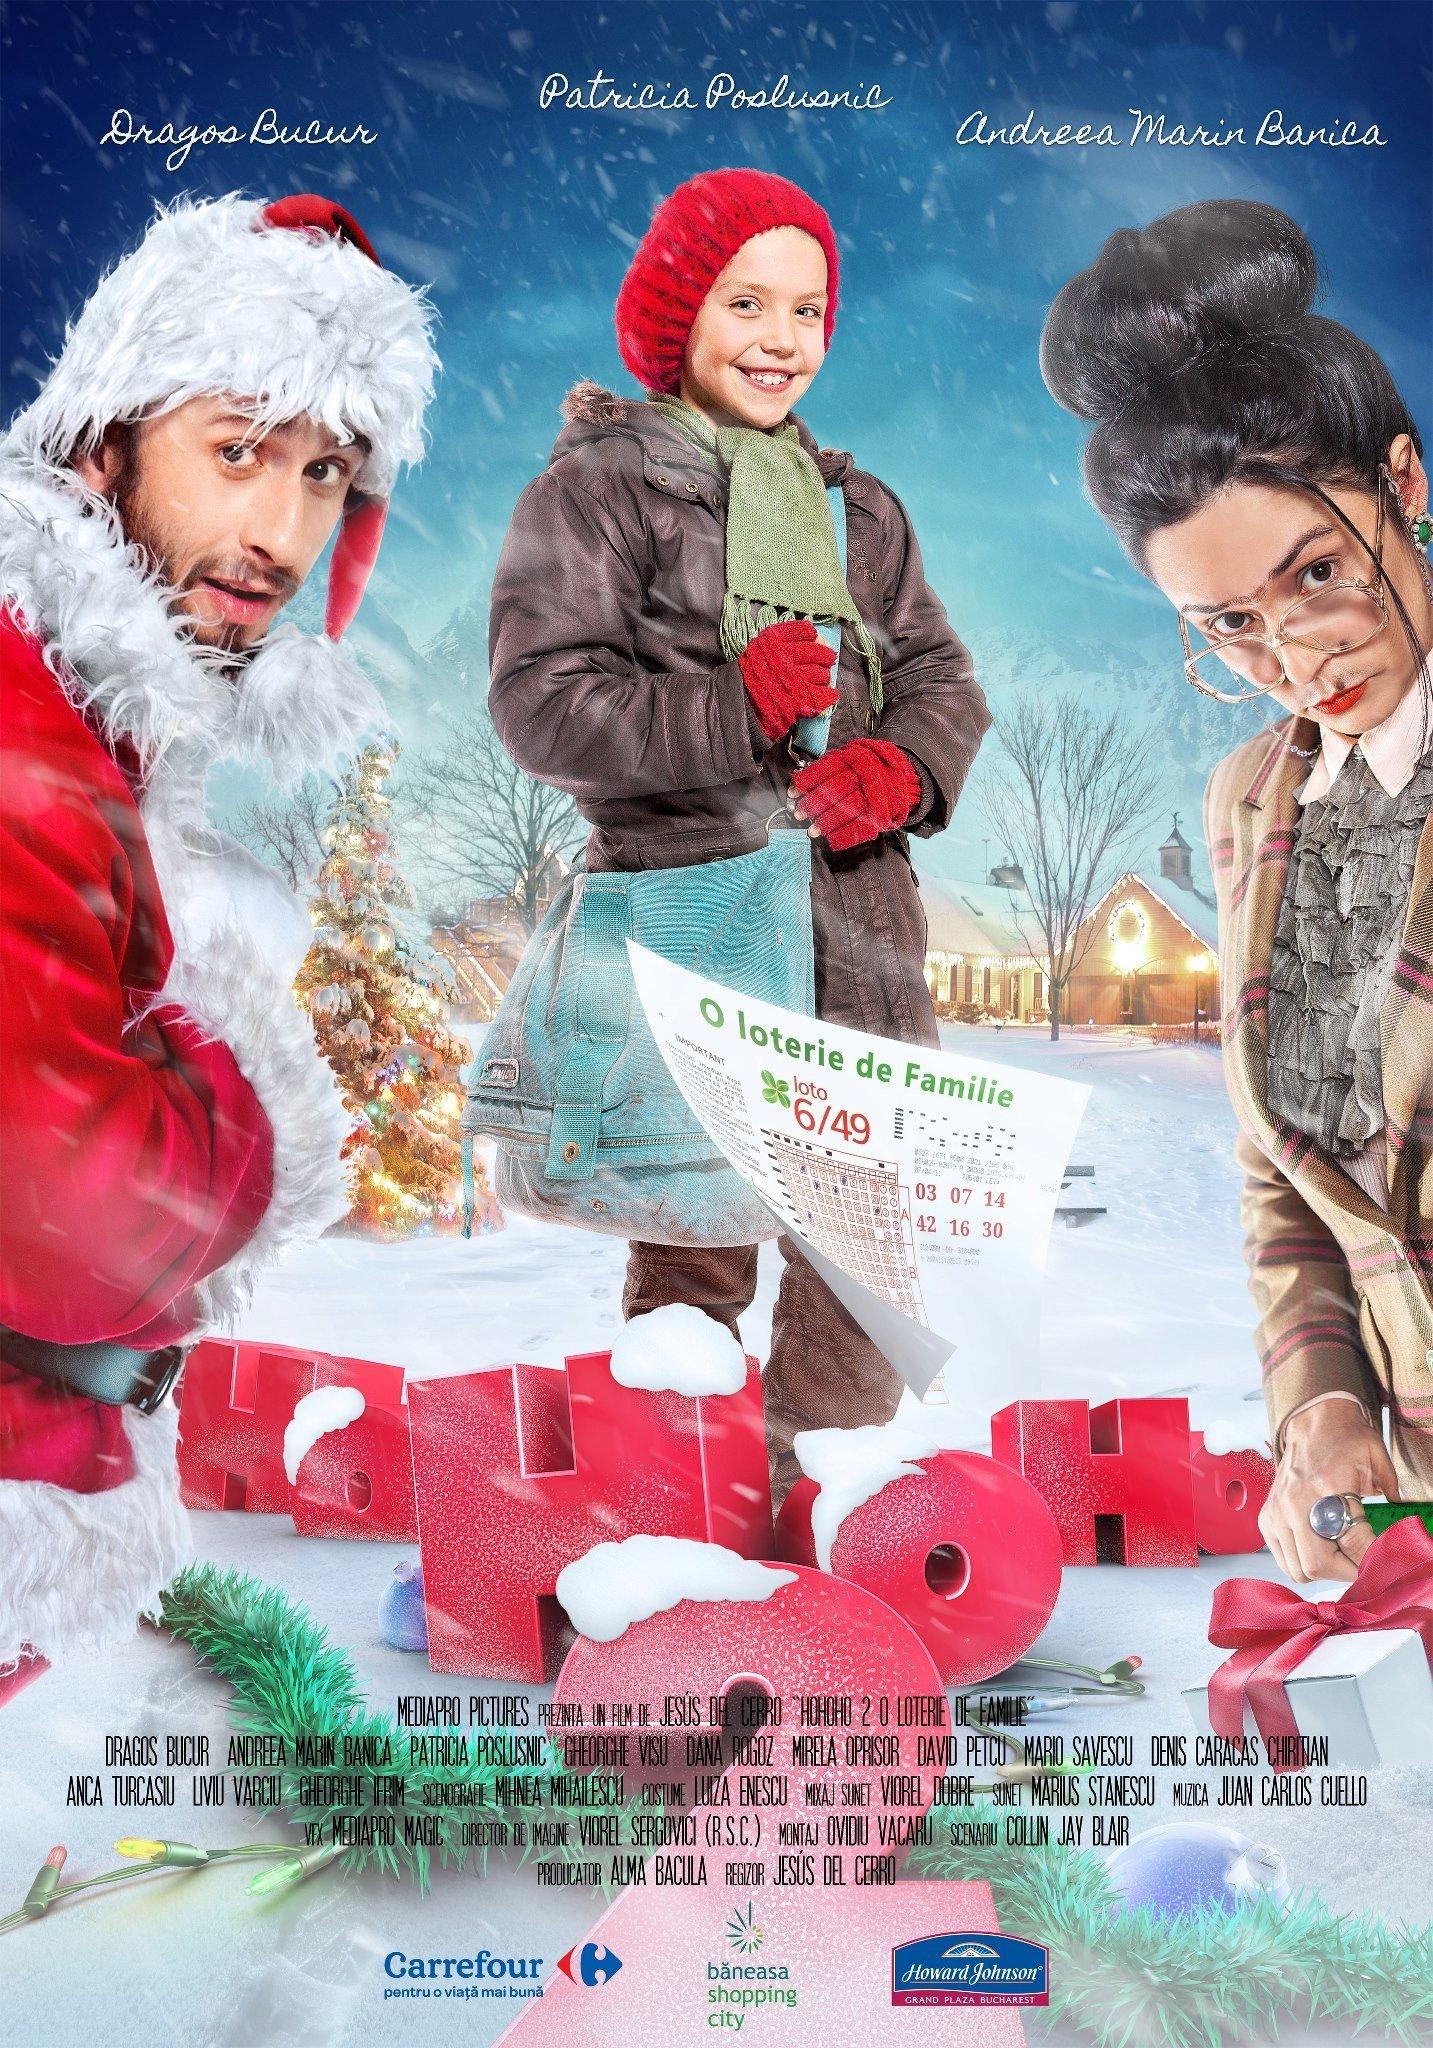 Ho Ho Ho 2: O loterie de familie (2012)